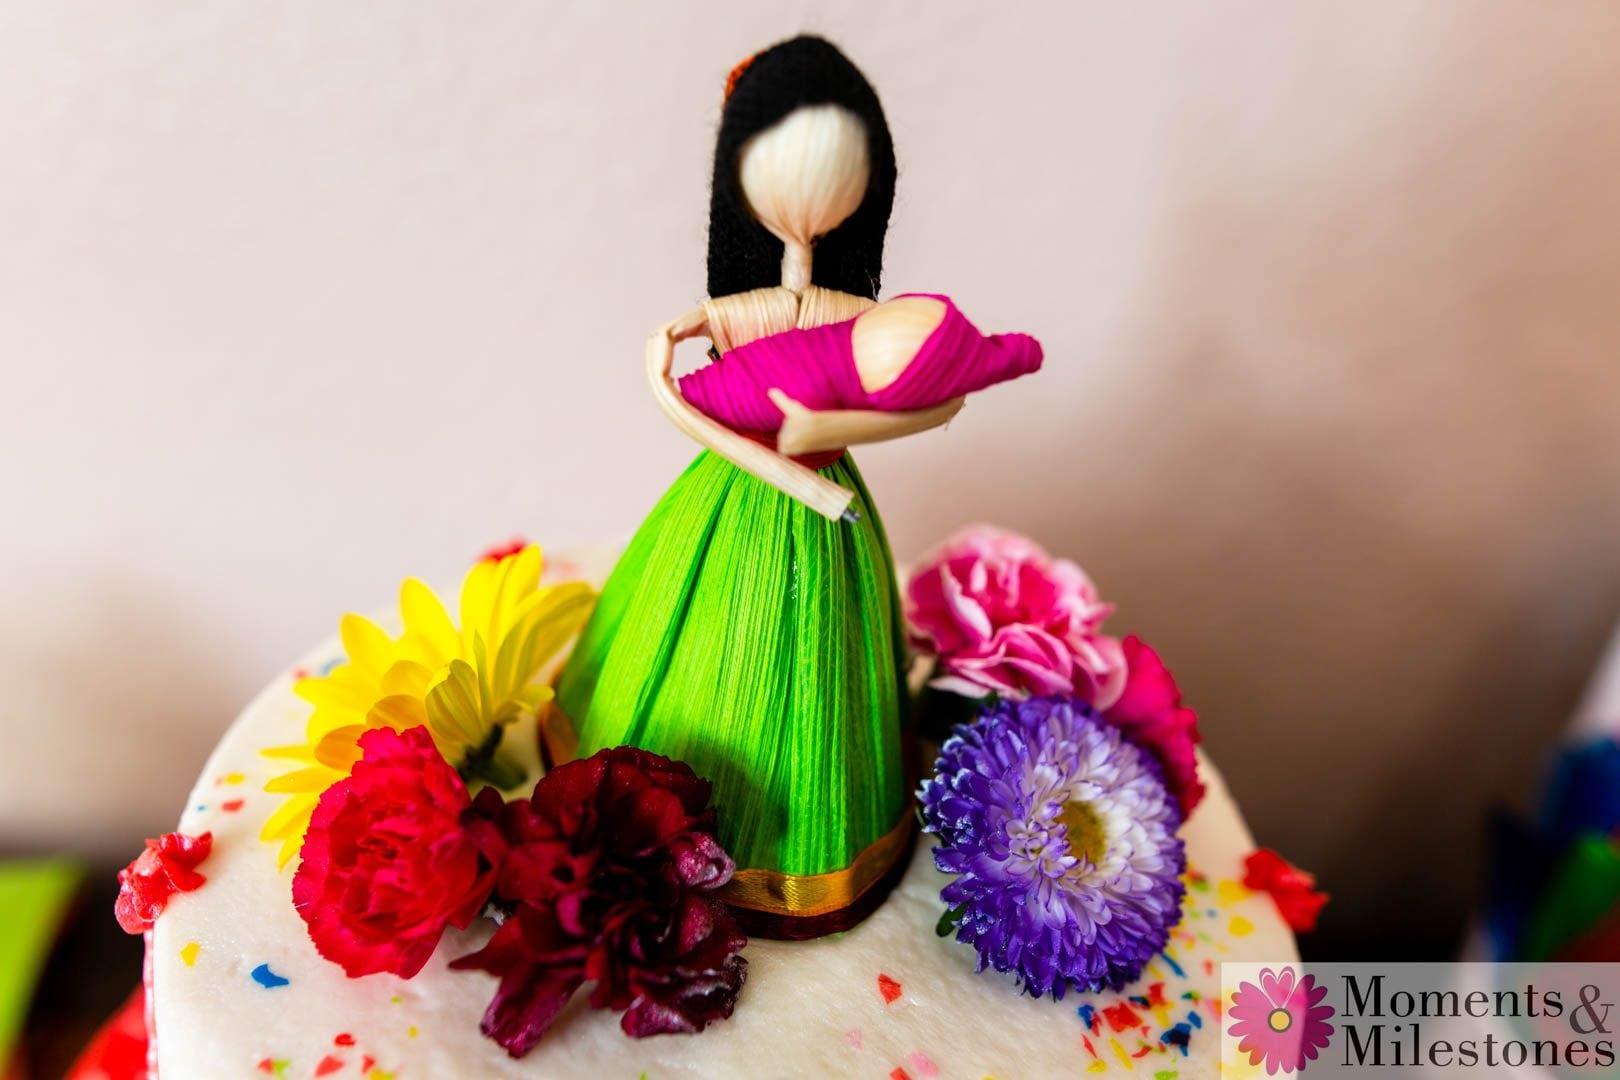 Gaylen Jorrie Fiesta Themed Baby Shower Design, Coordinating and Photography